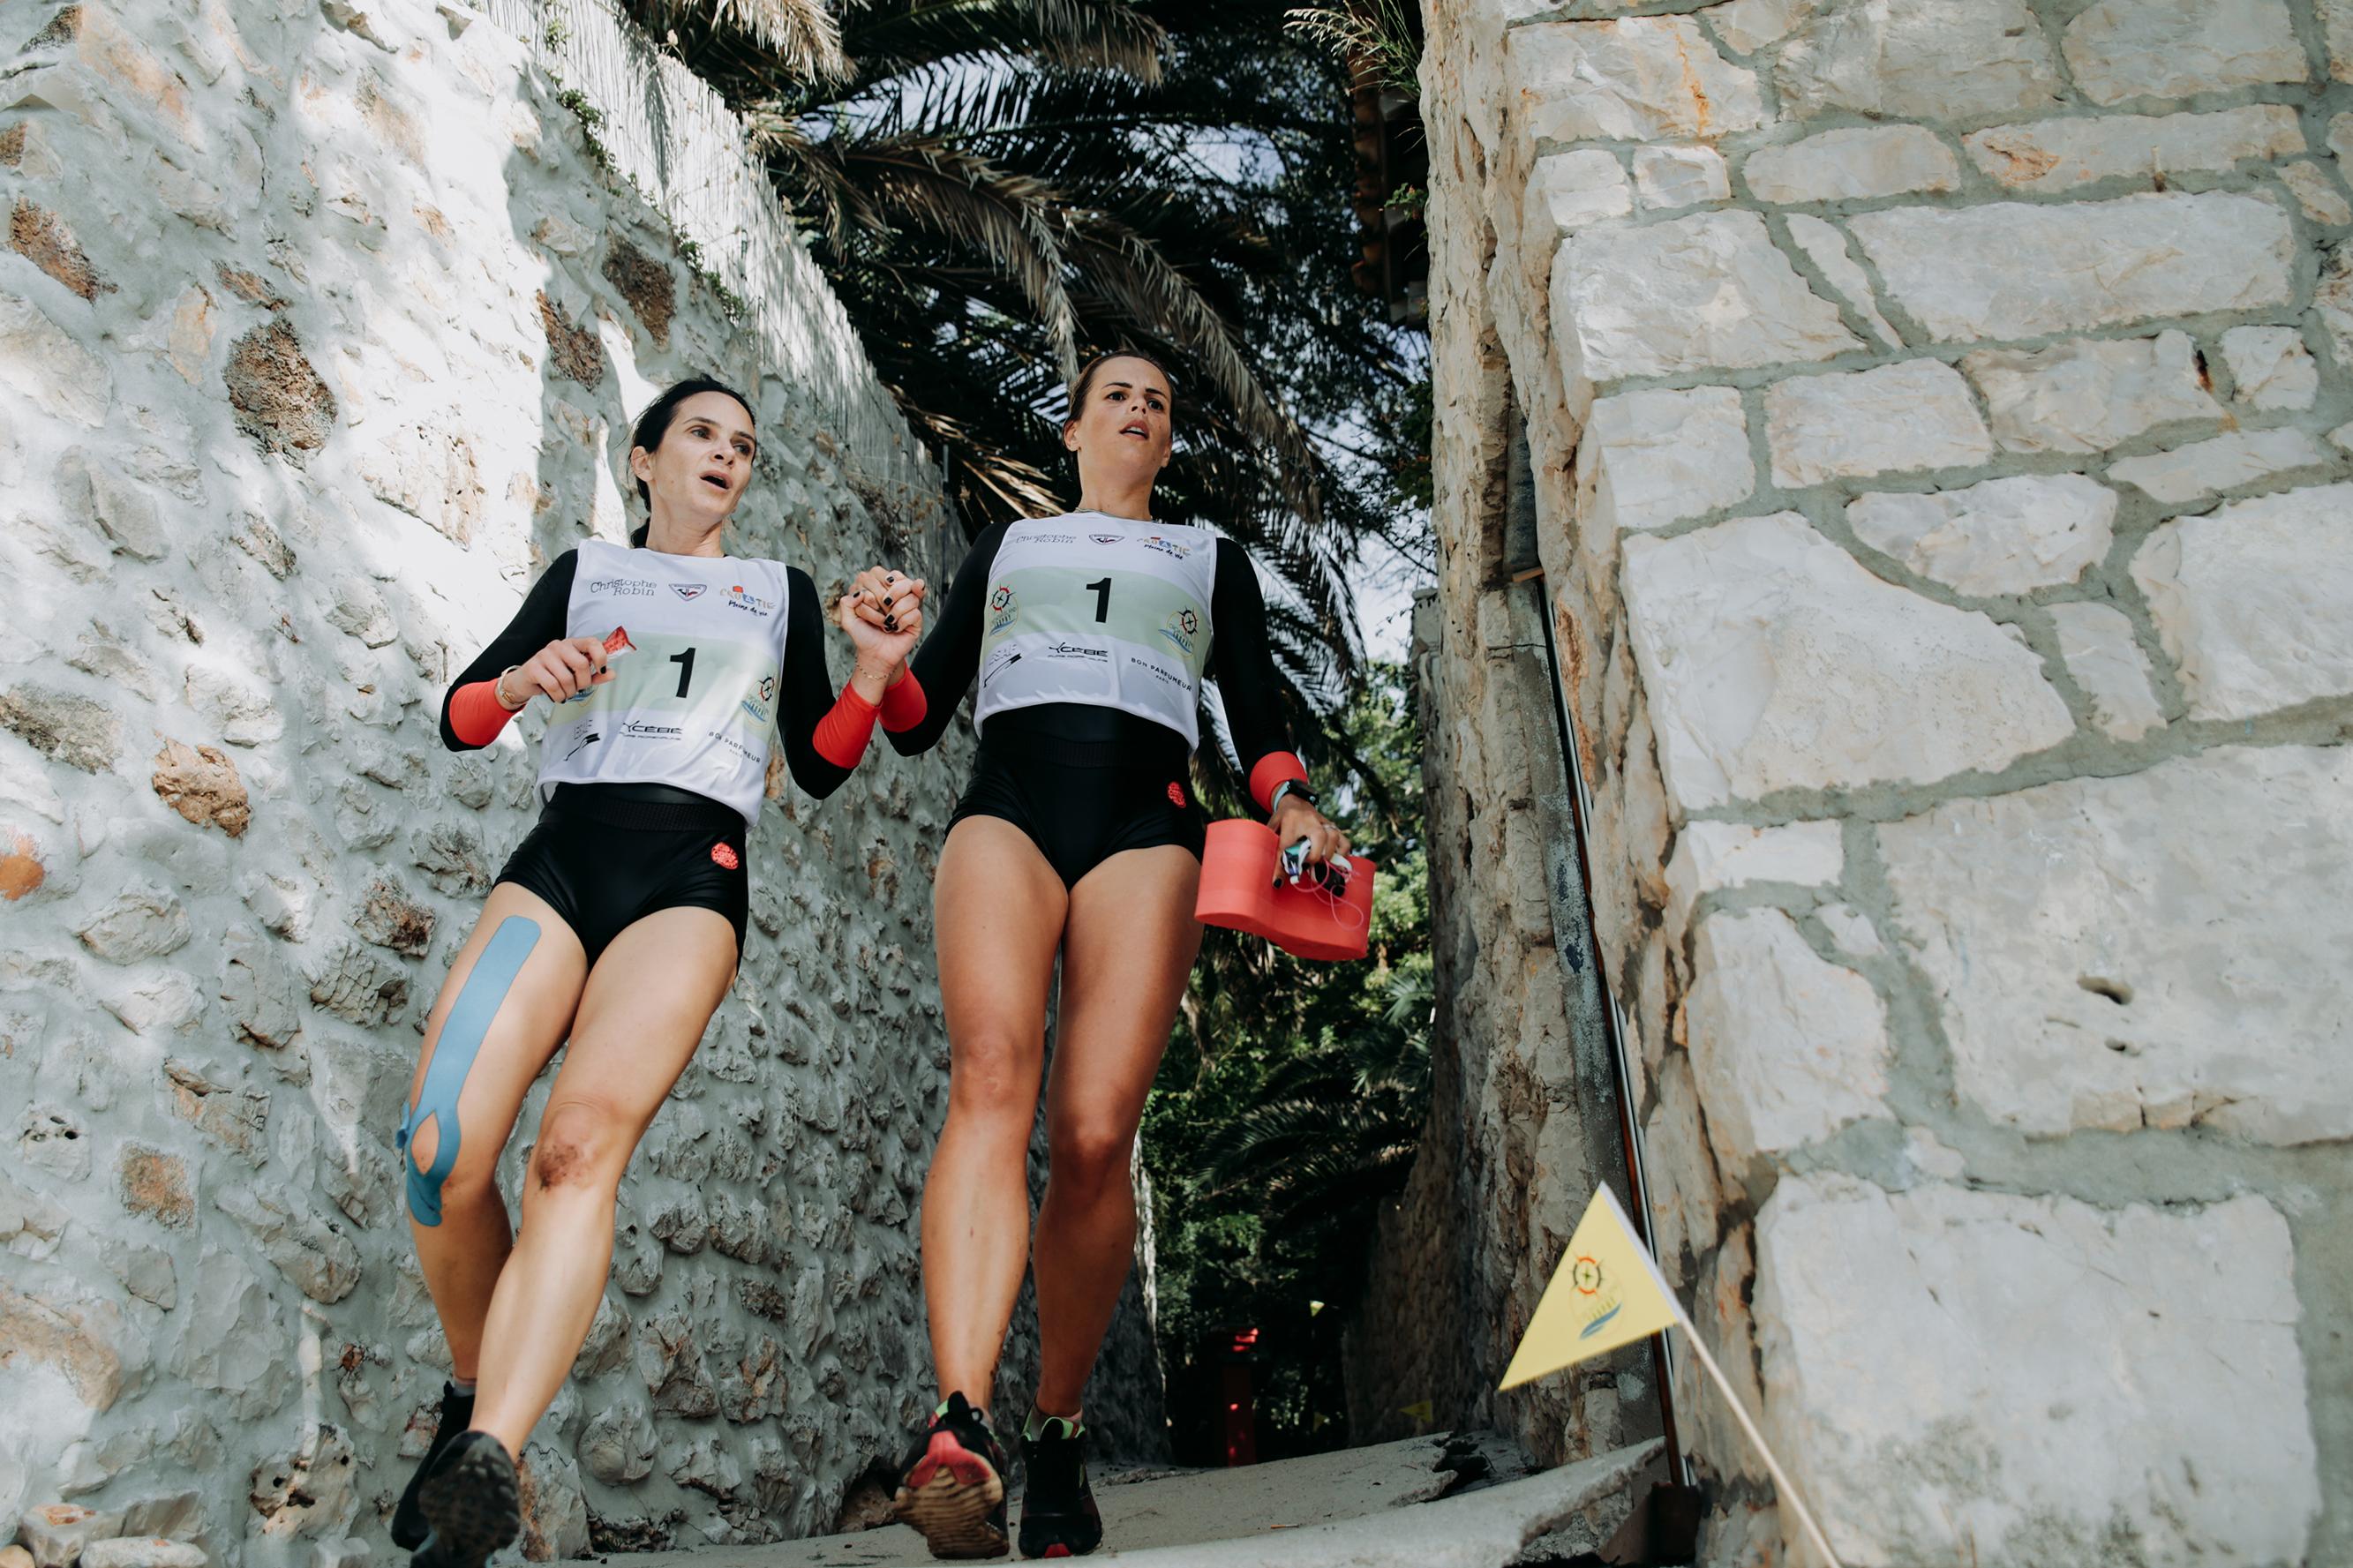 croatia island trophy 2018 raid féminin sportif laure manaudou